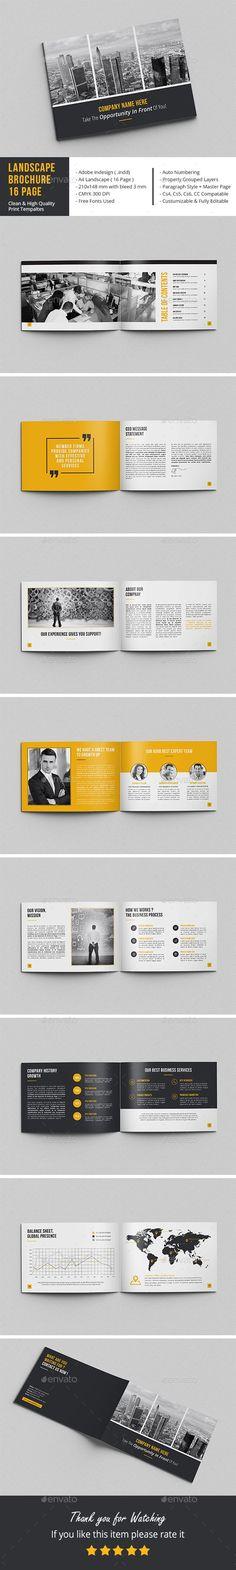 Landscape Brochure Design Template 16 Page - Corporate Brochure Template InDesign INDD. Download here: https://graphicriver.net/item/landscape-brochure-16-page/16950438?s_rank=13&ref=yinkira